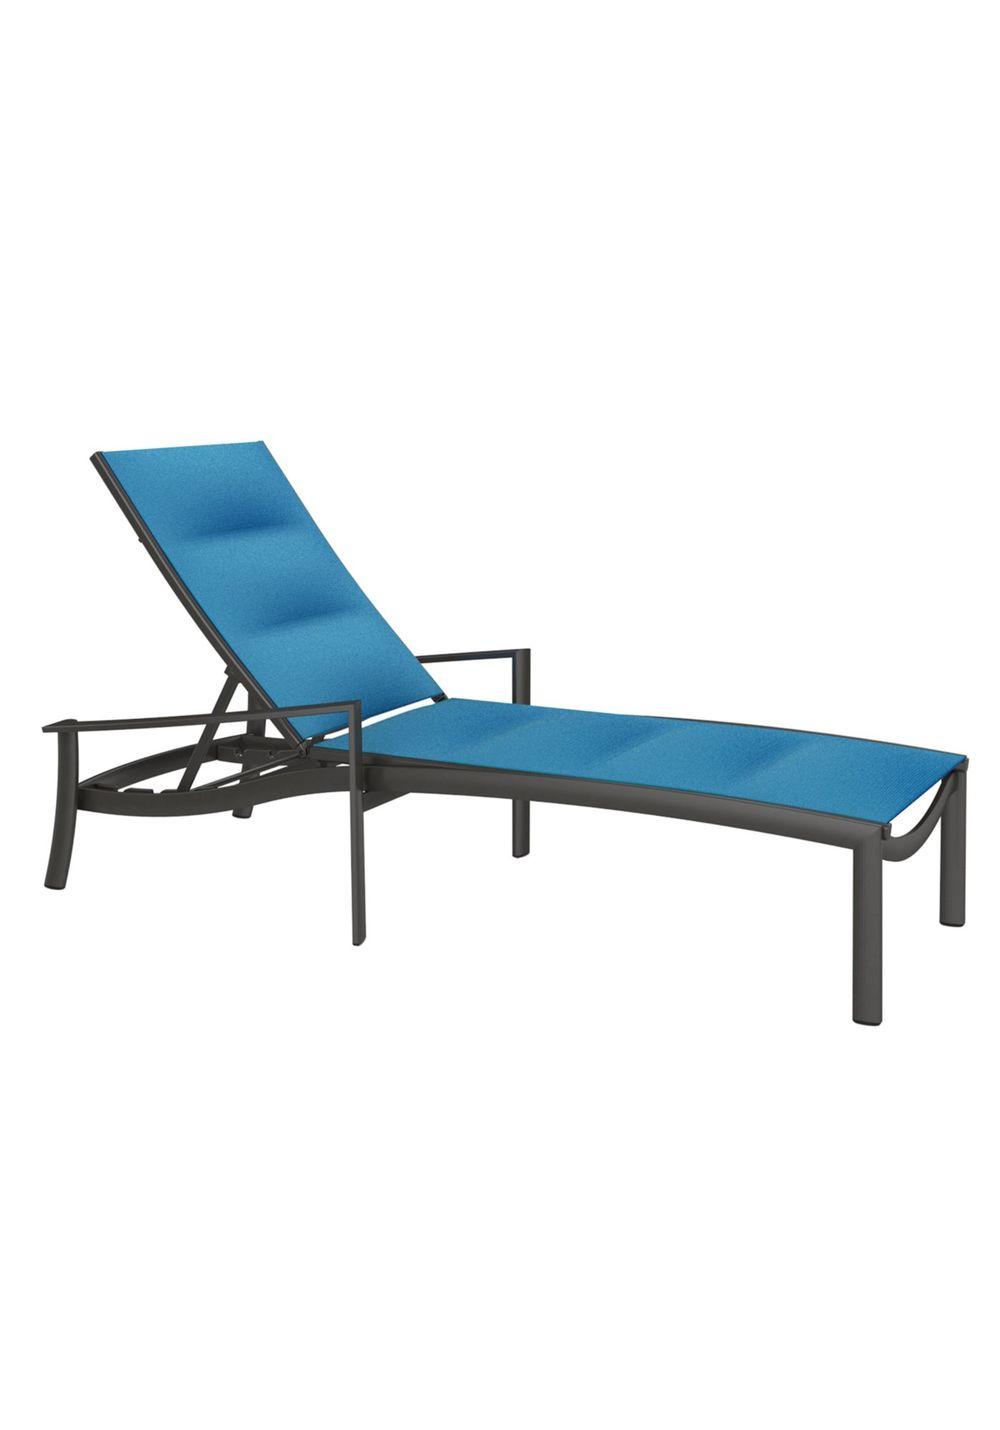 TROPITONE FURNITURE CO, INC - Chaise Lounge